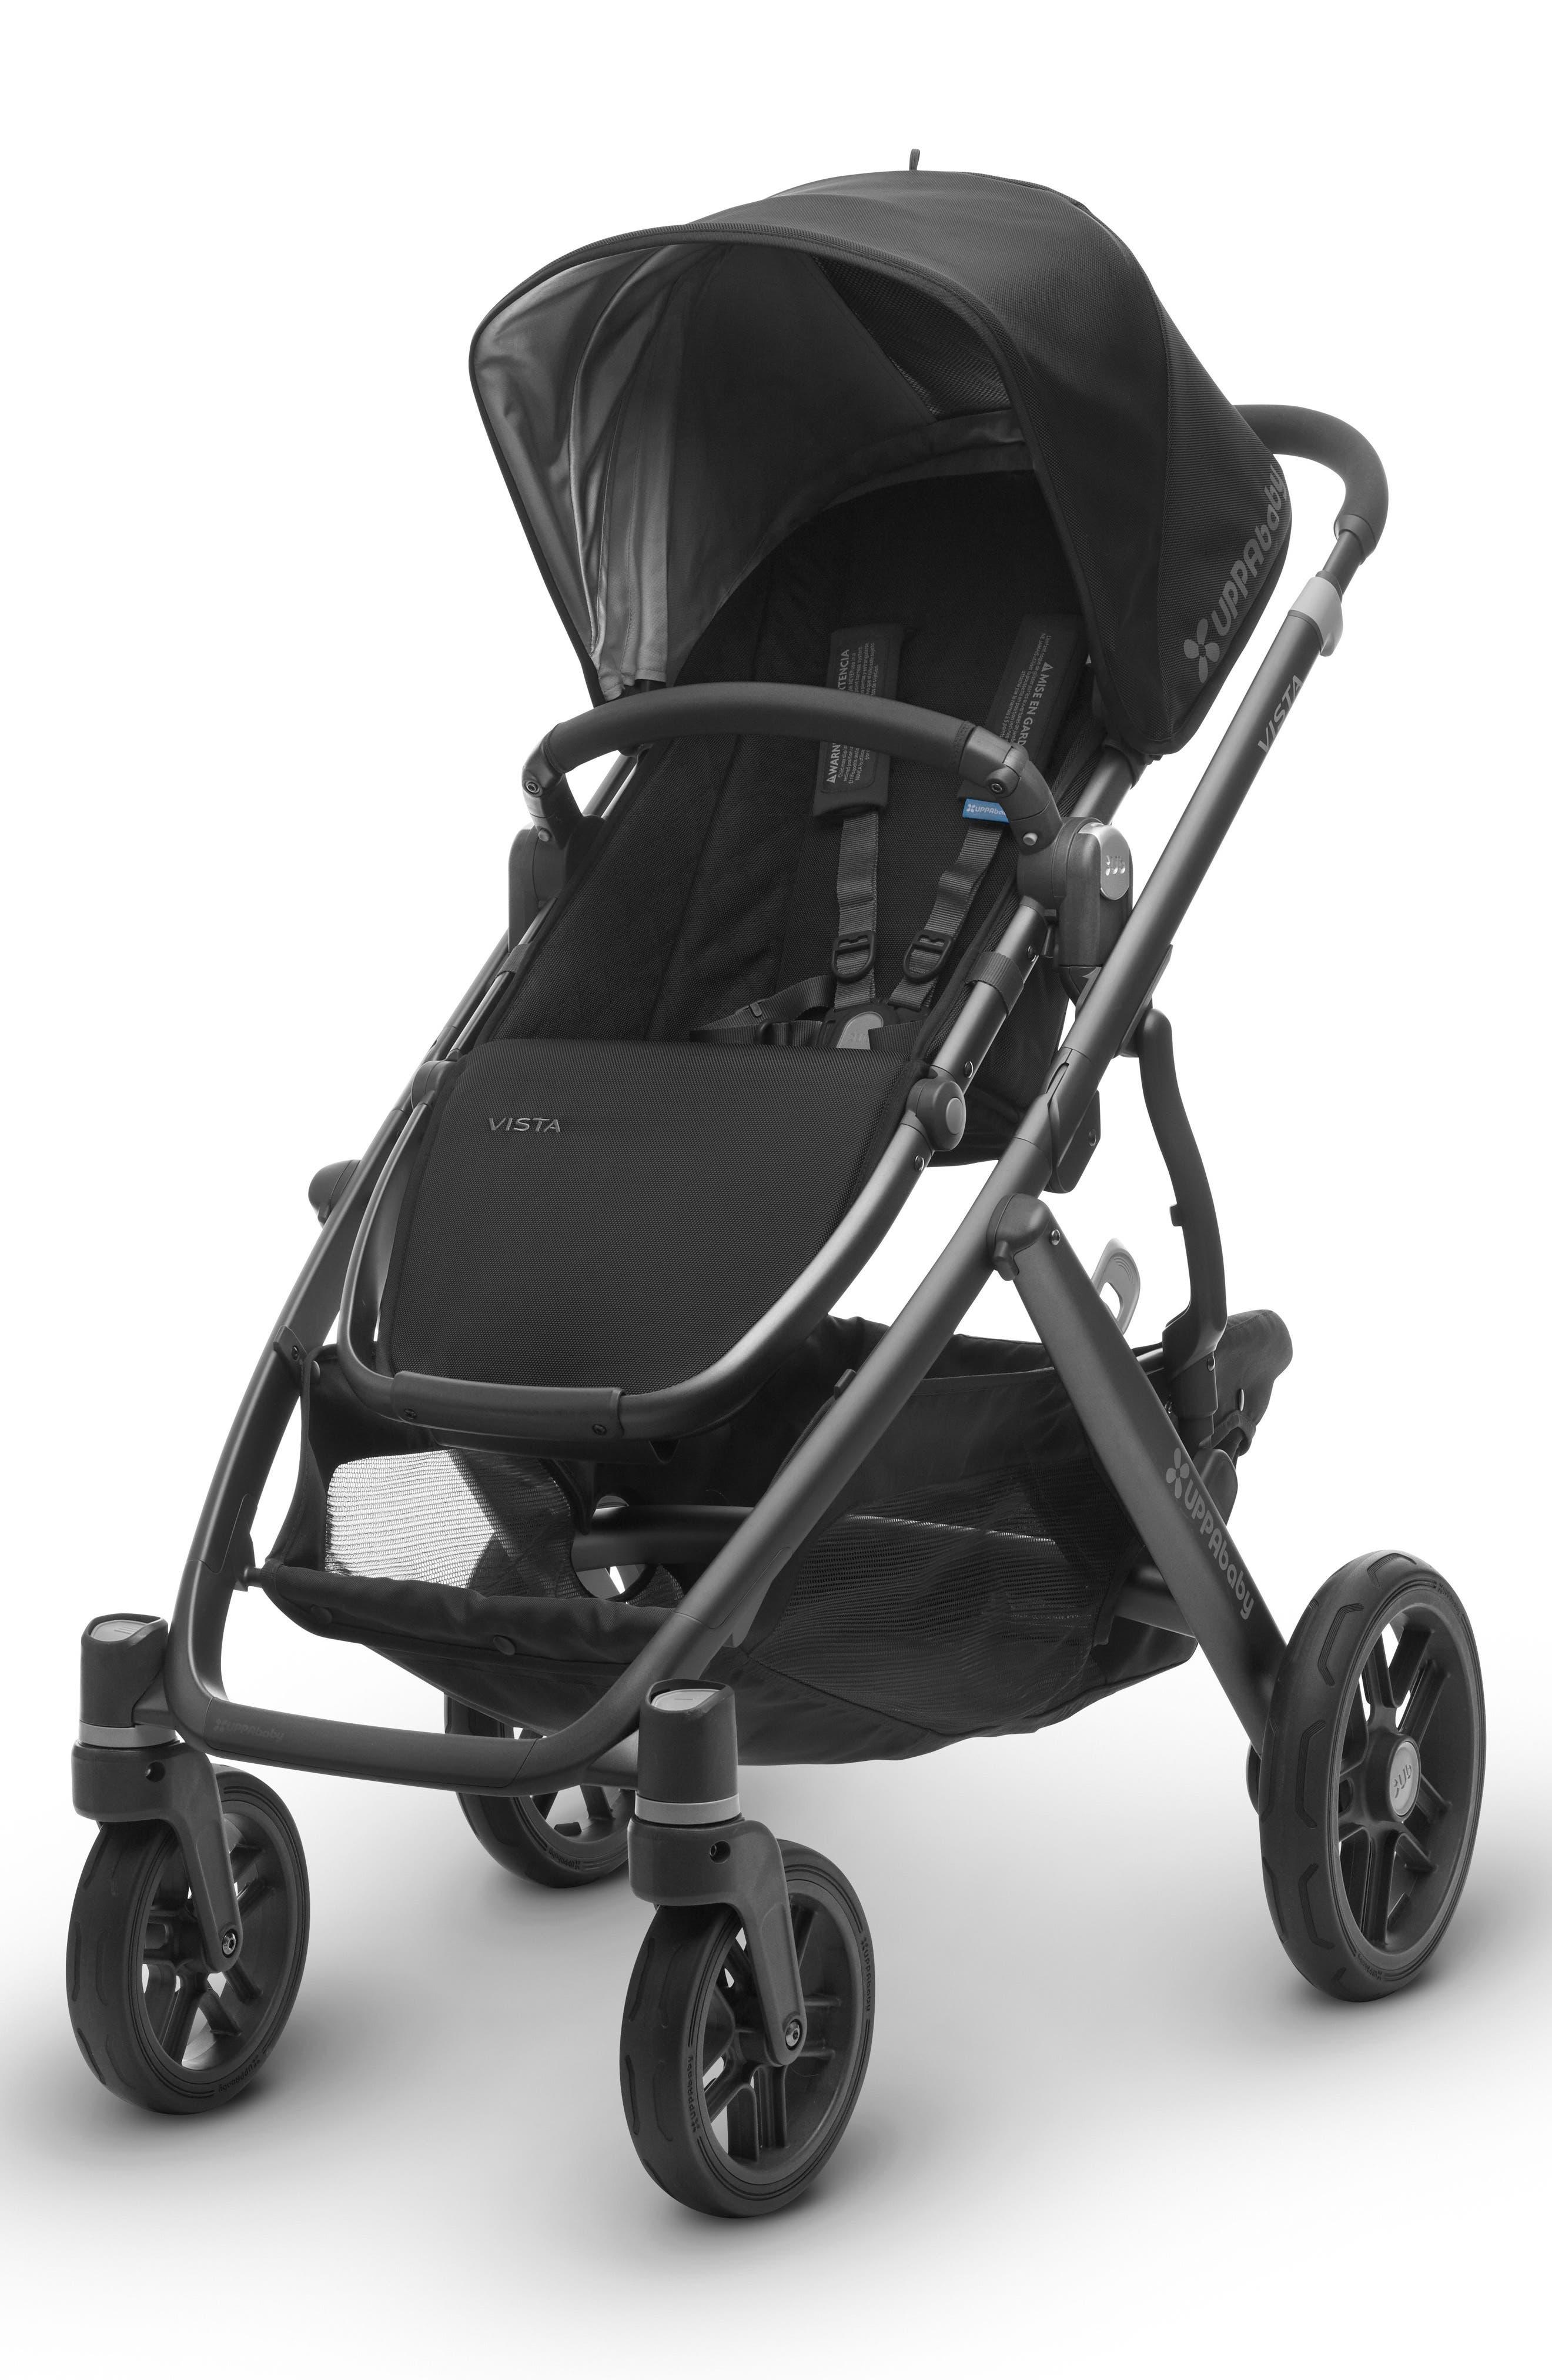 2017 VISTA Aluminum Frame Convertible Stroller with Bassinet & Toddler Seat,                             Main thumbnail 1, color,                             001